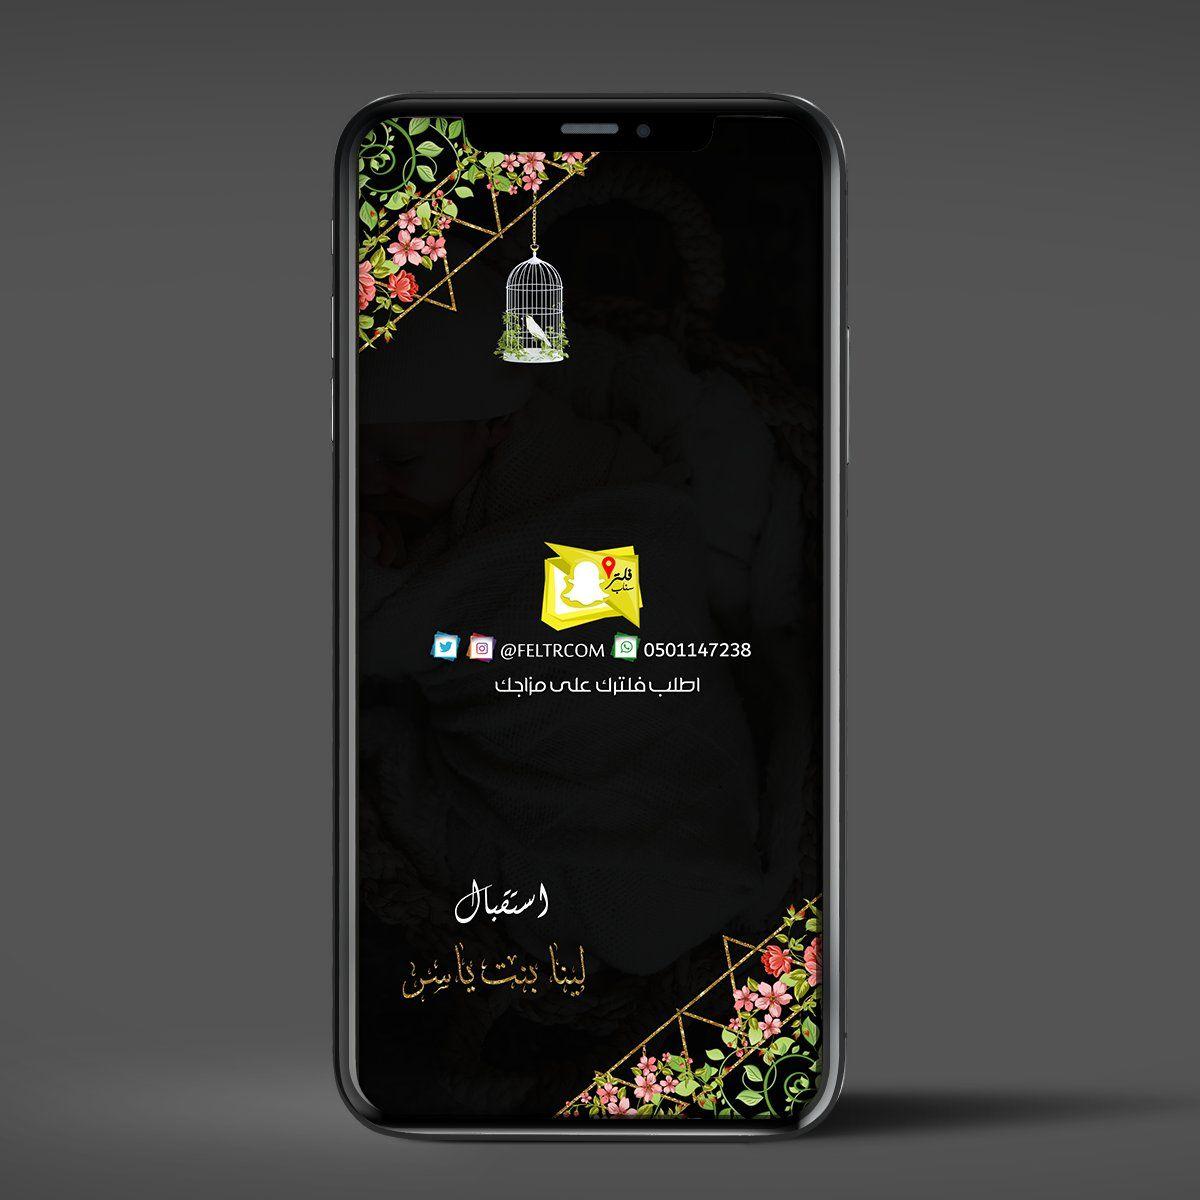 فلتر سناب Filter Snap Feltrcom تويتر Girly Pictures Galaxy Phone Samsung Galaxy Phone